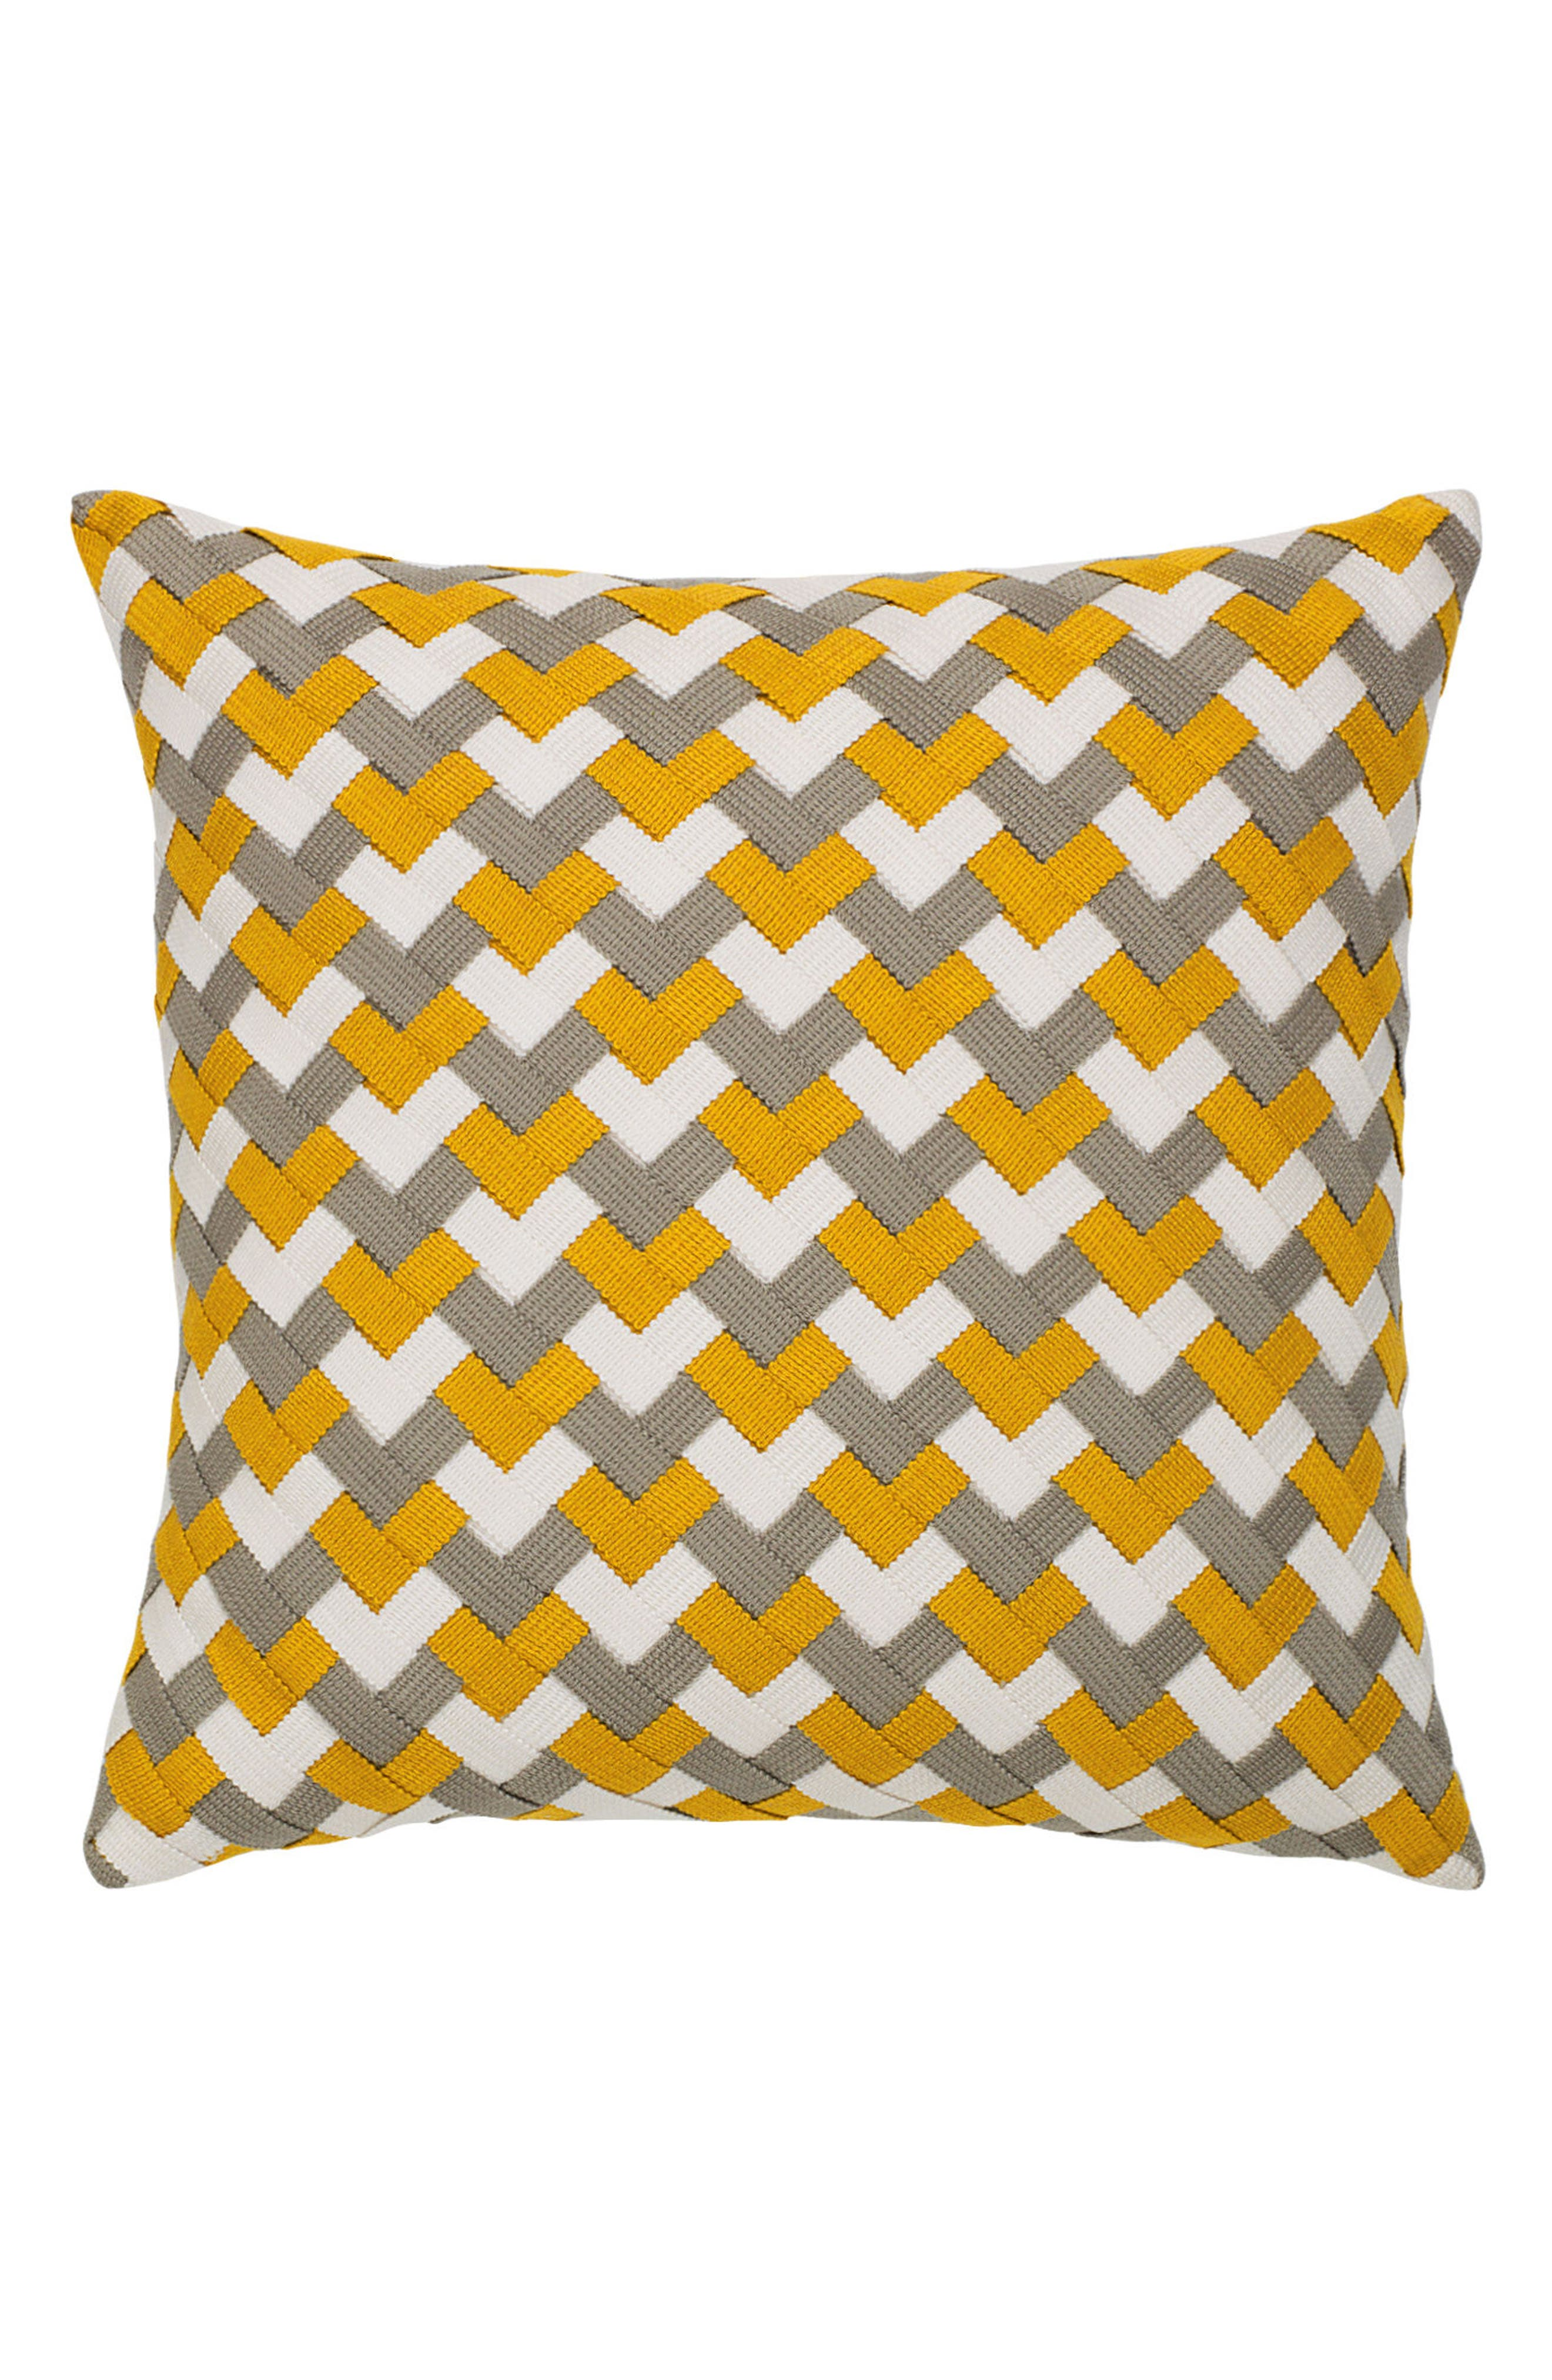 Metallic Basket Weave Indoor/Outdoor Accent Pillow,                             Main thumbnail 1, color,                             GOLD/ GREY